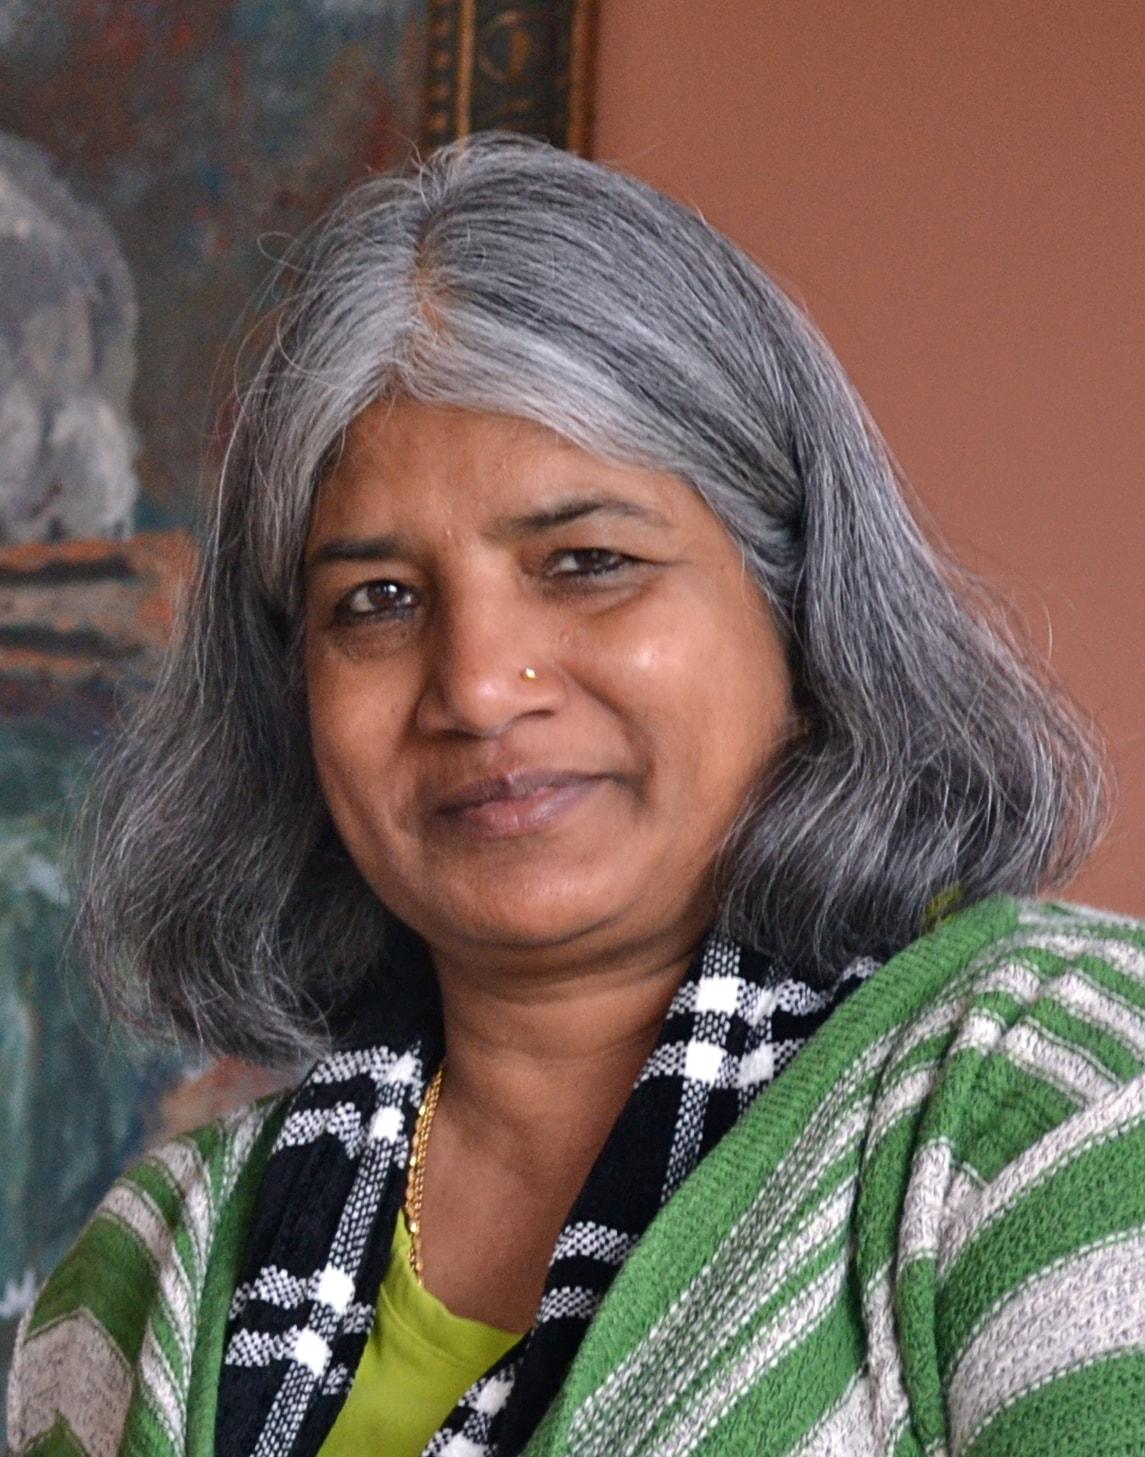 Jyotsna from Antigonish